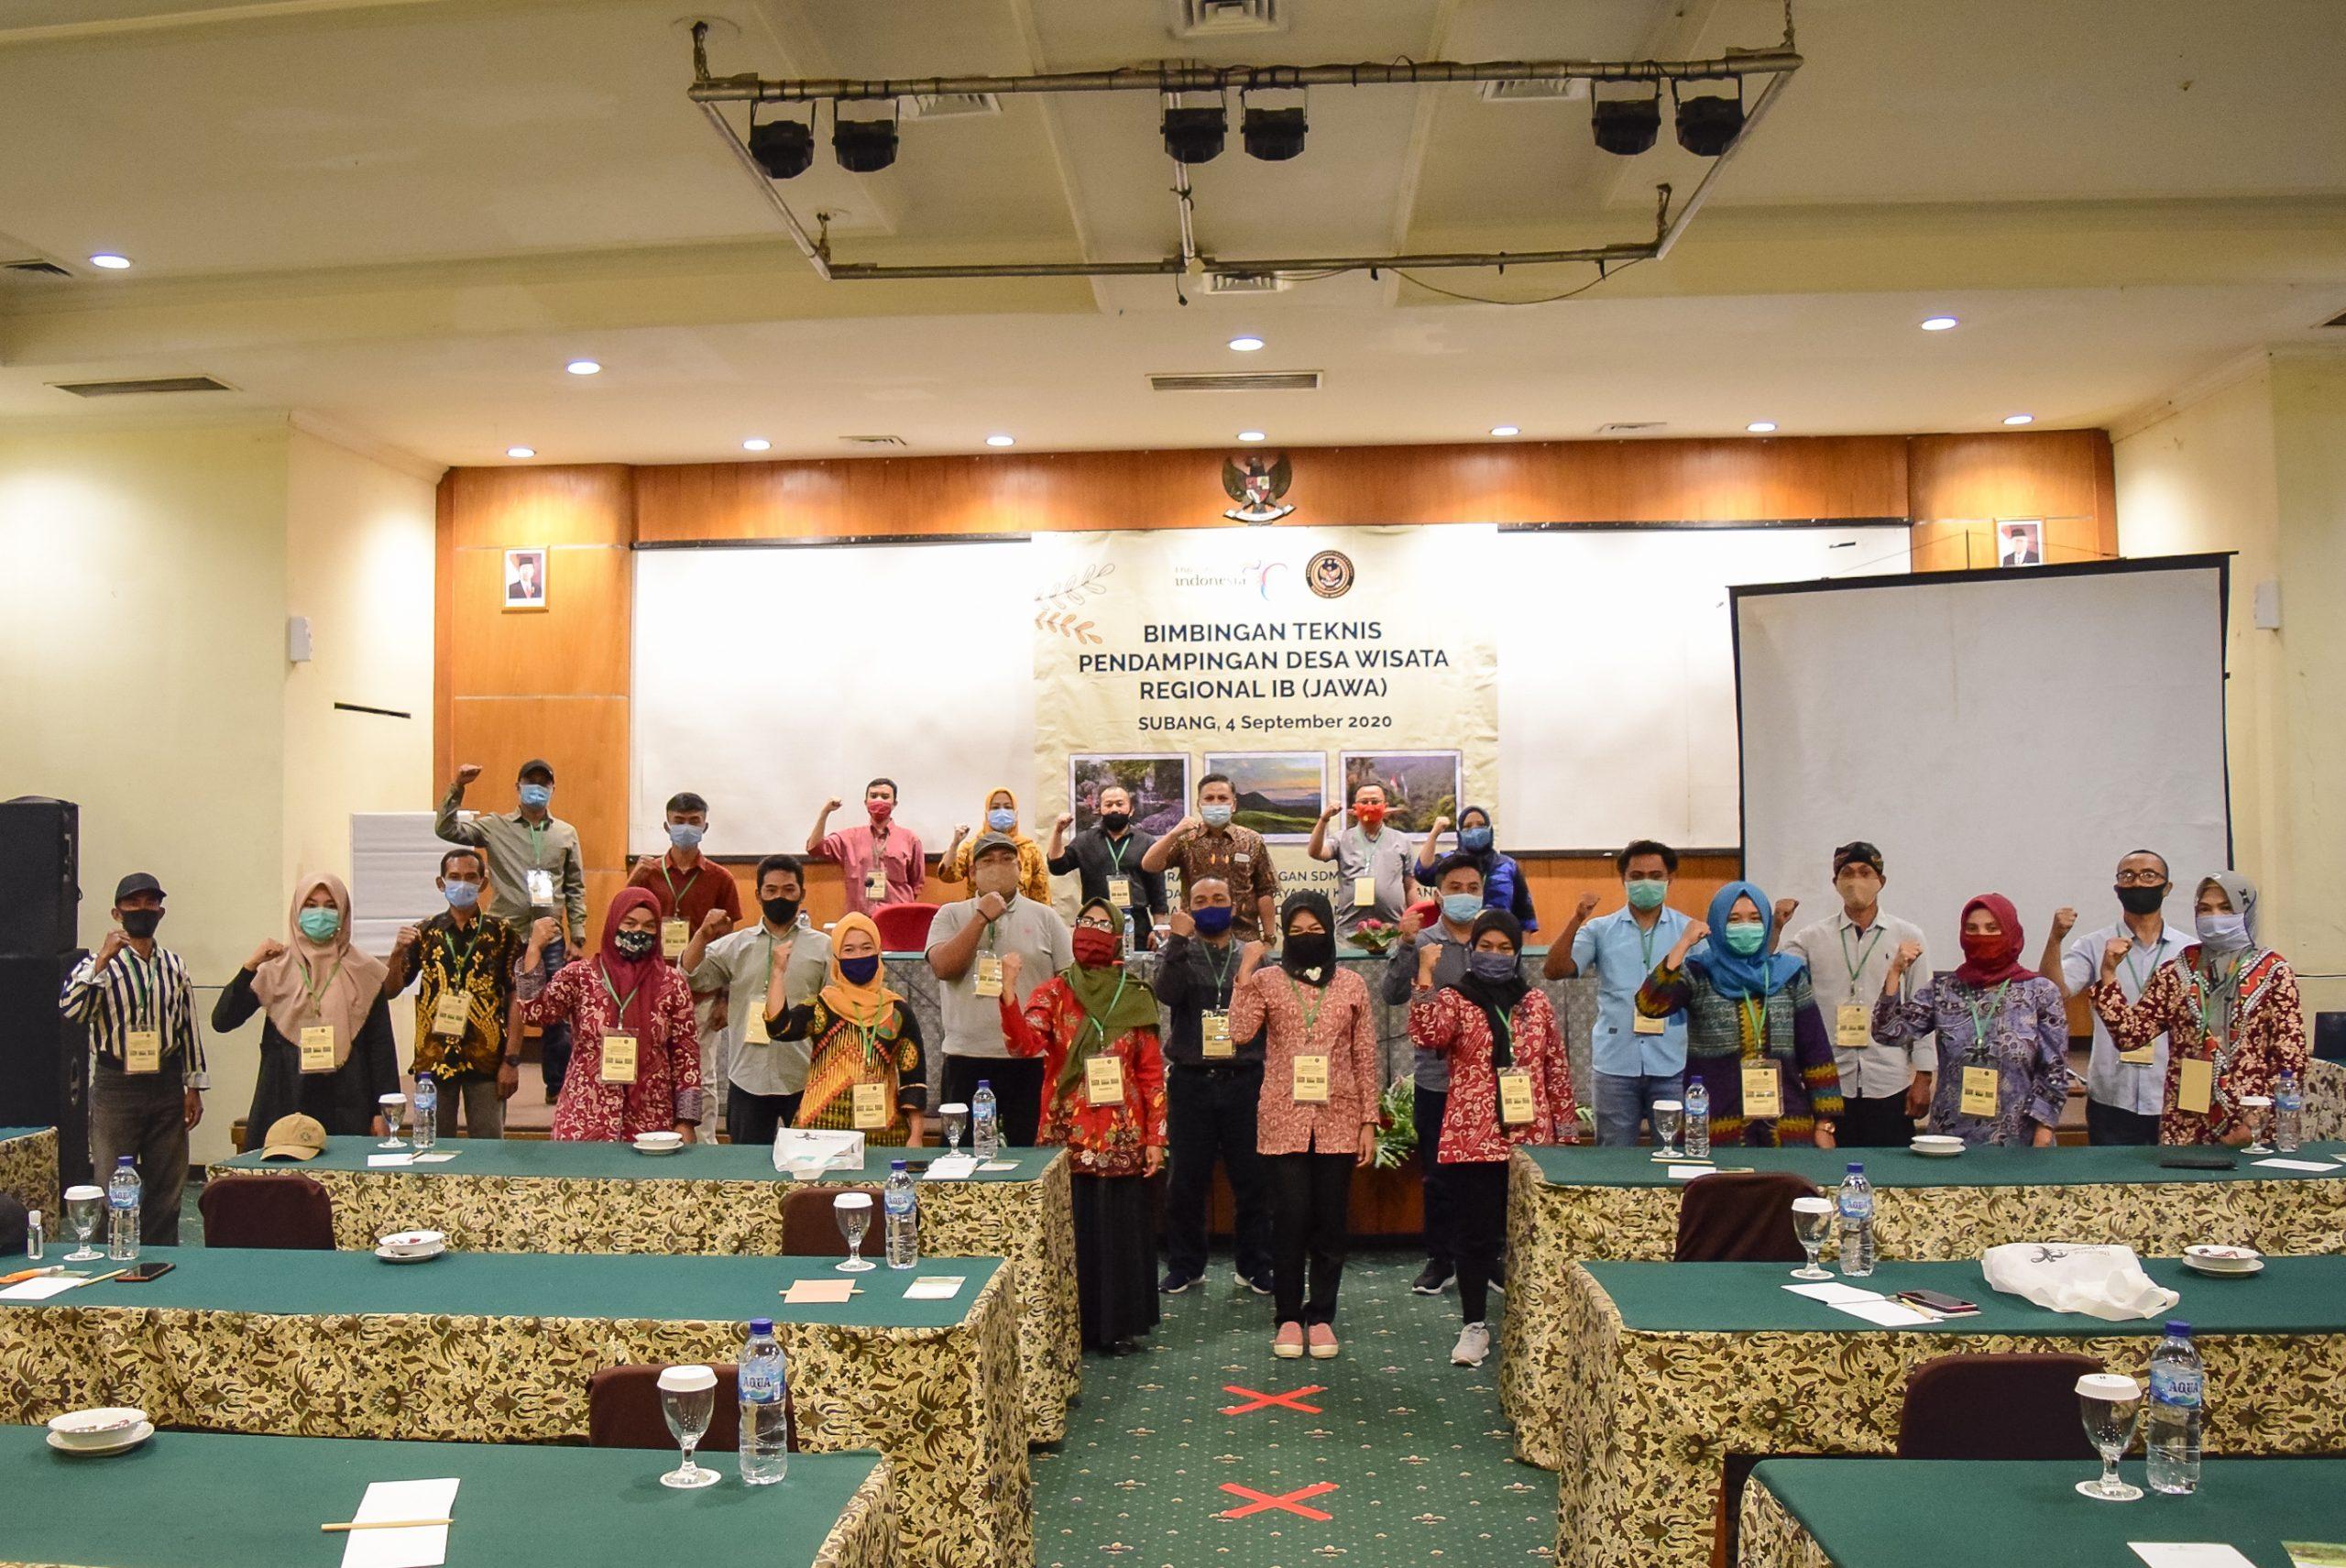 Bimbingan Teknis Pendampingan Desa Wisata Regional IB (Jawa)